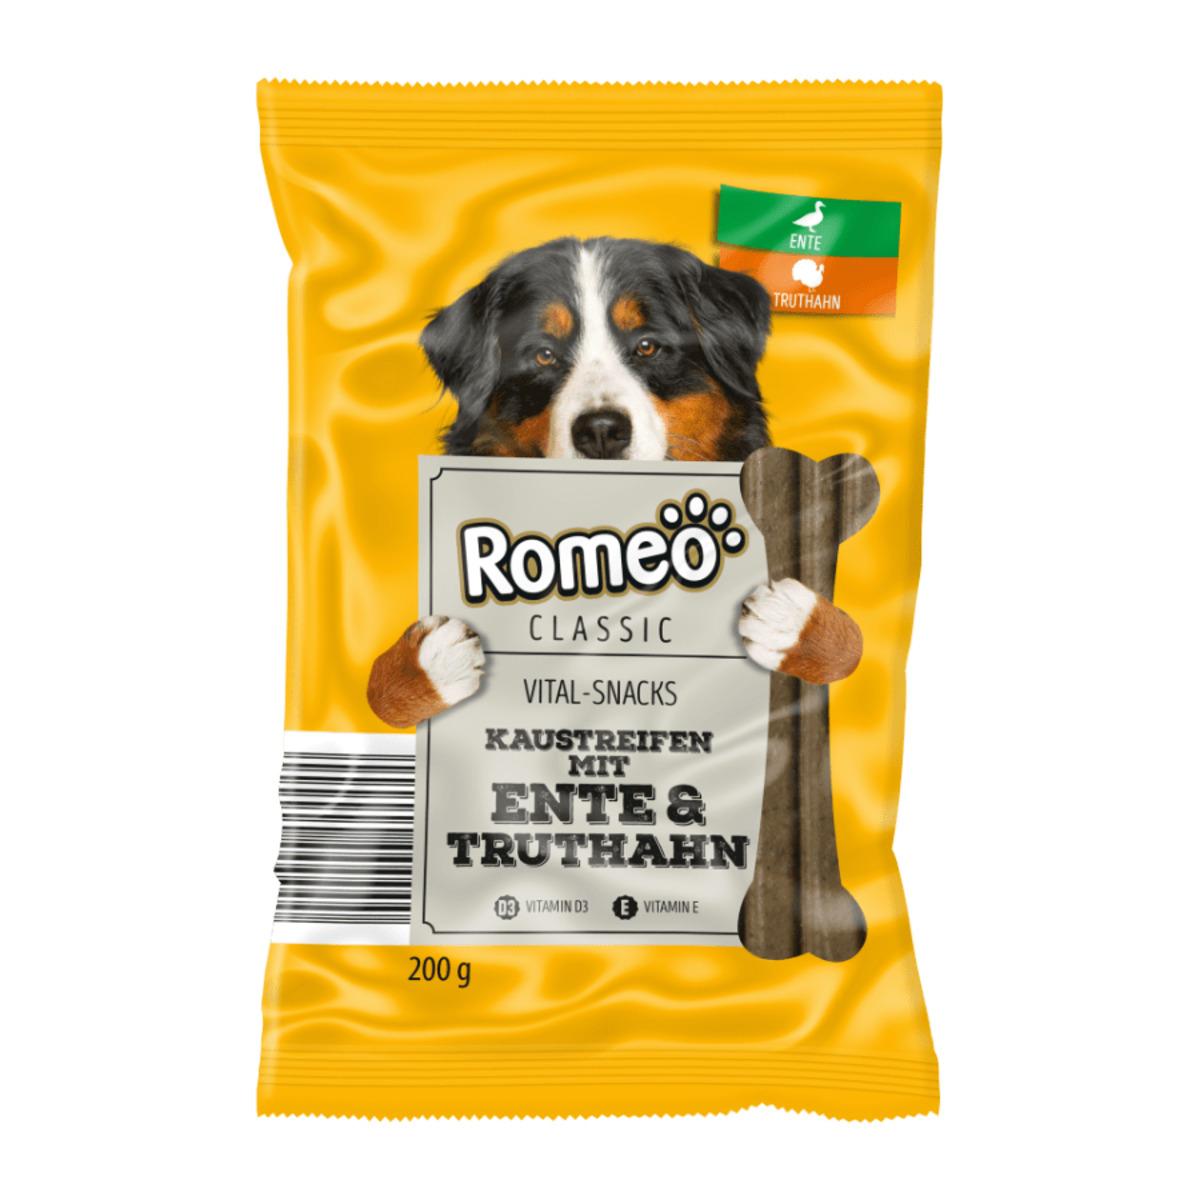 Bild 5 von ROMEO     Hundesnacks